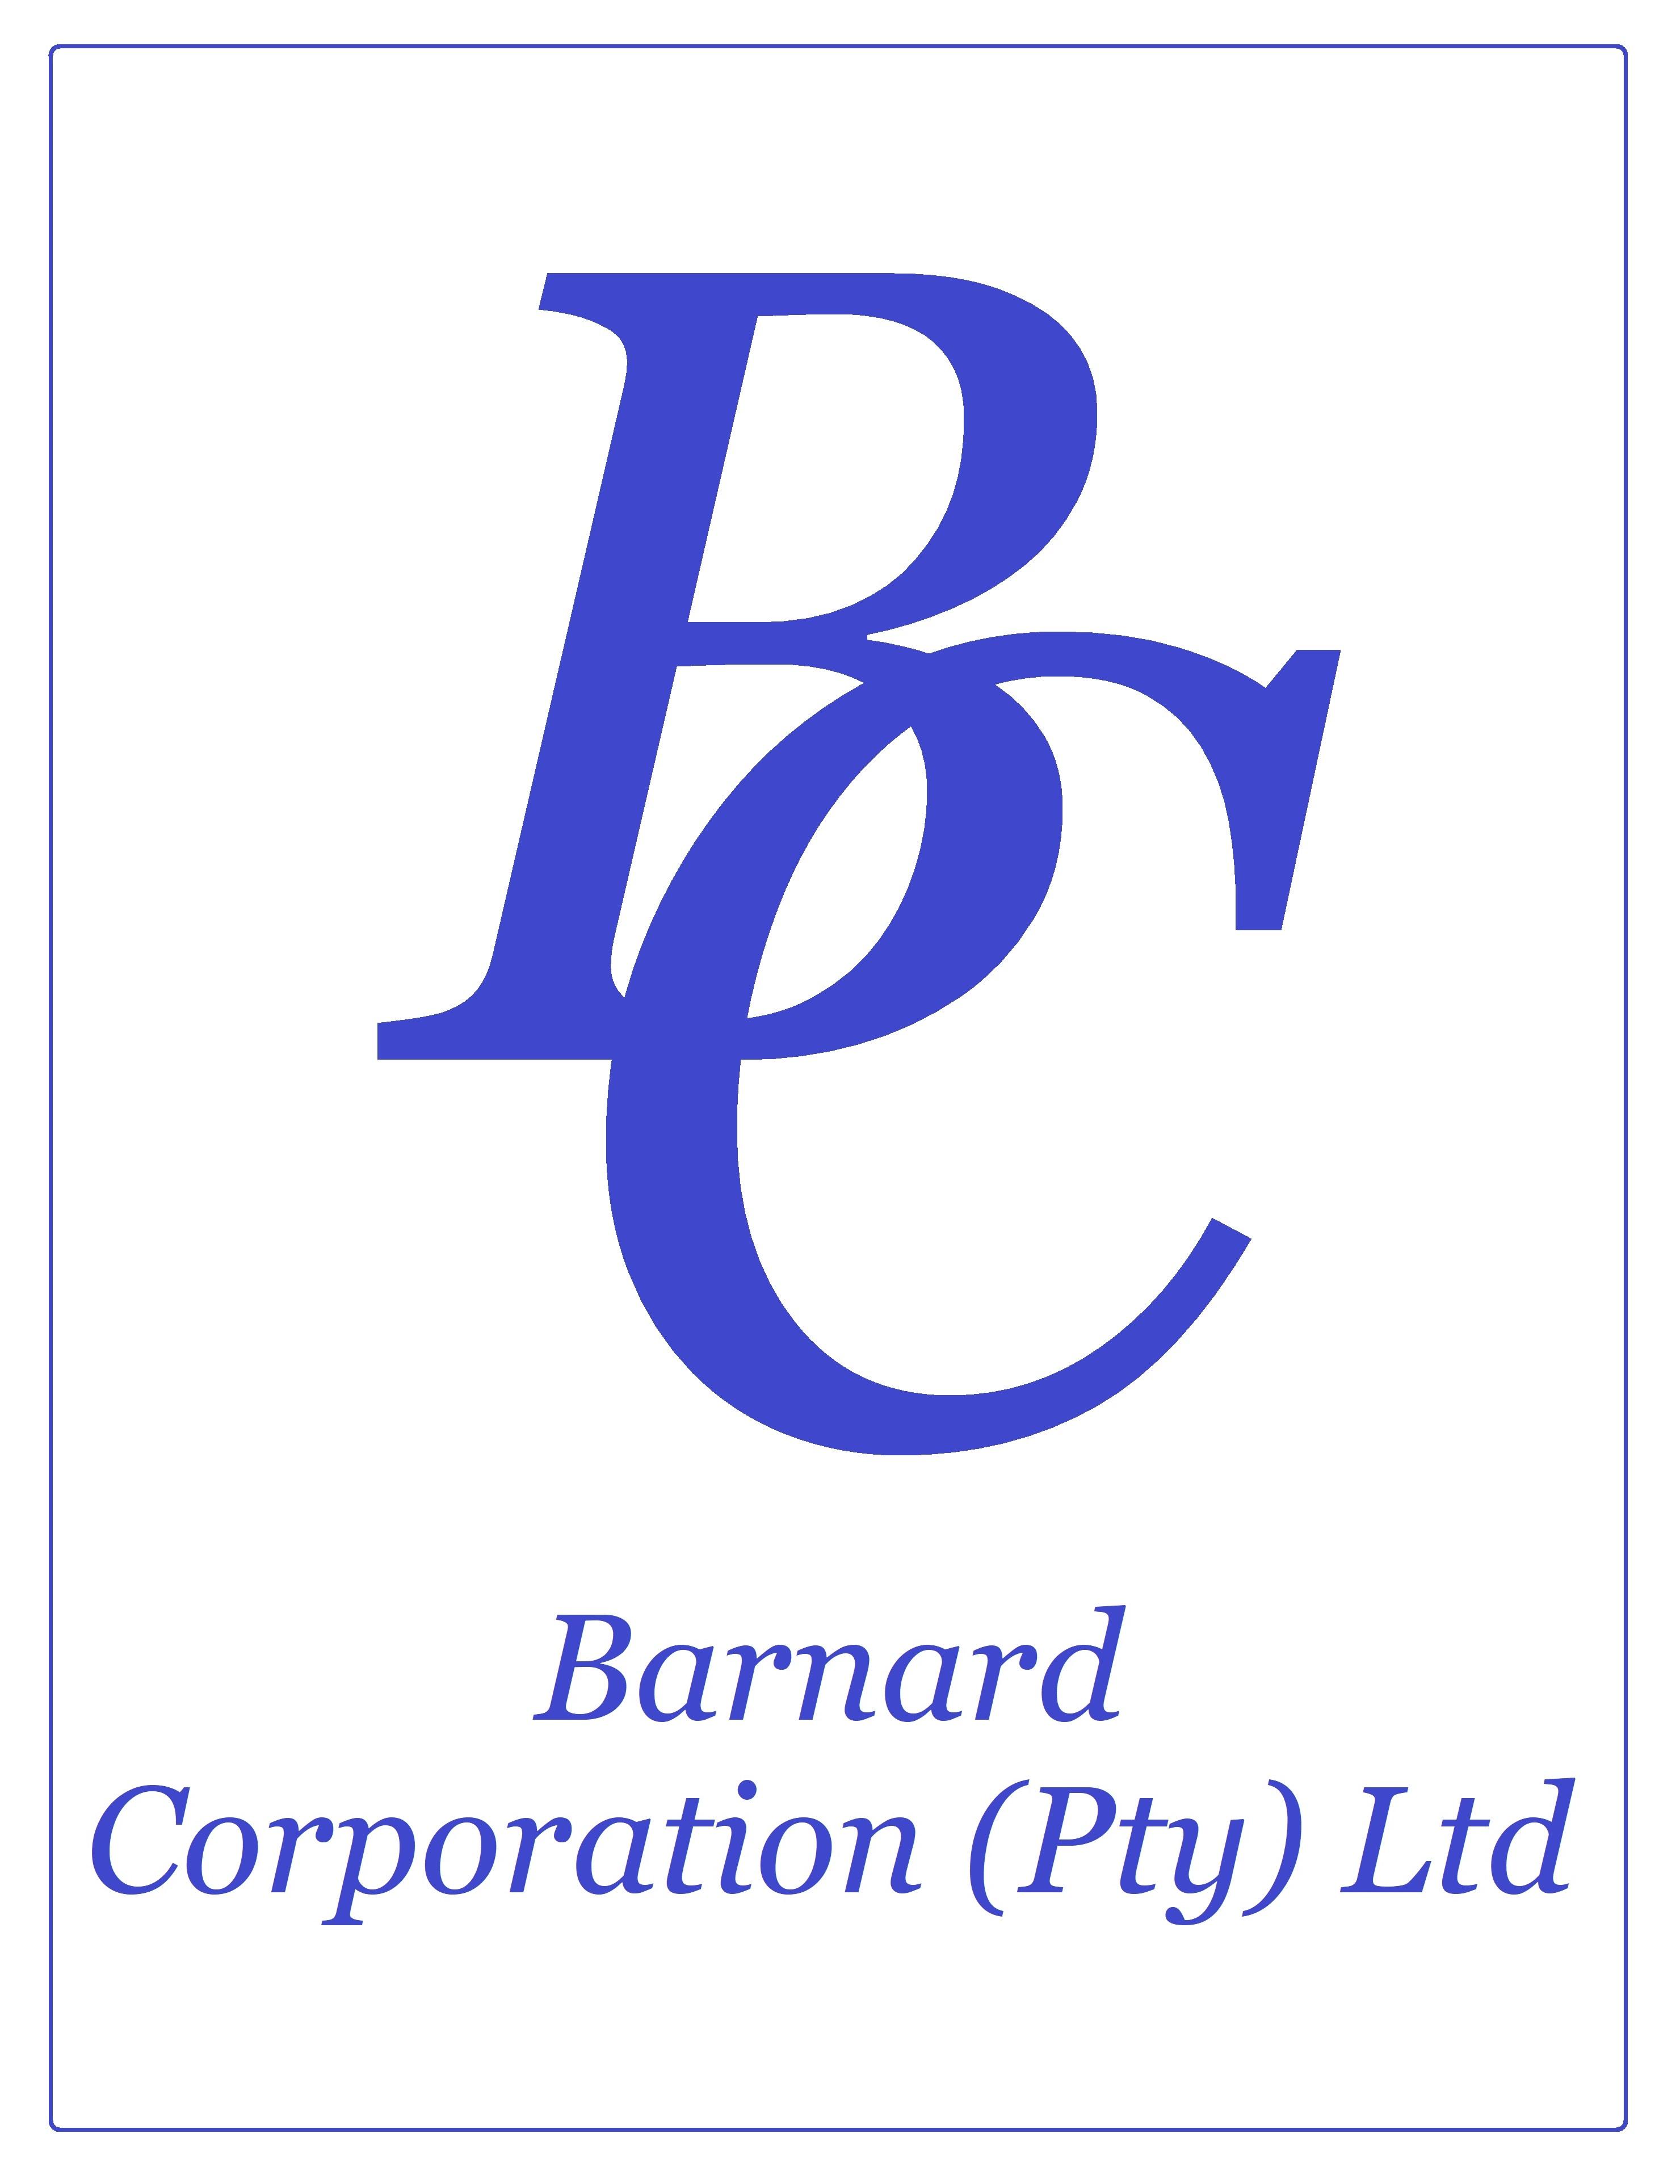 Barnard Corporation (Pty) Ltd.